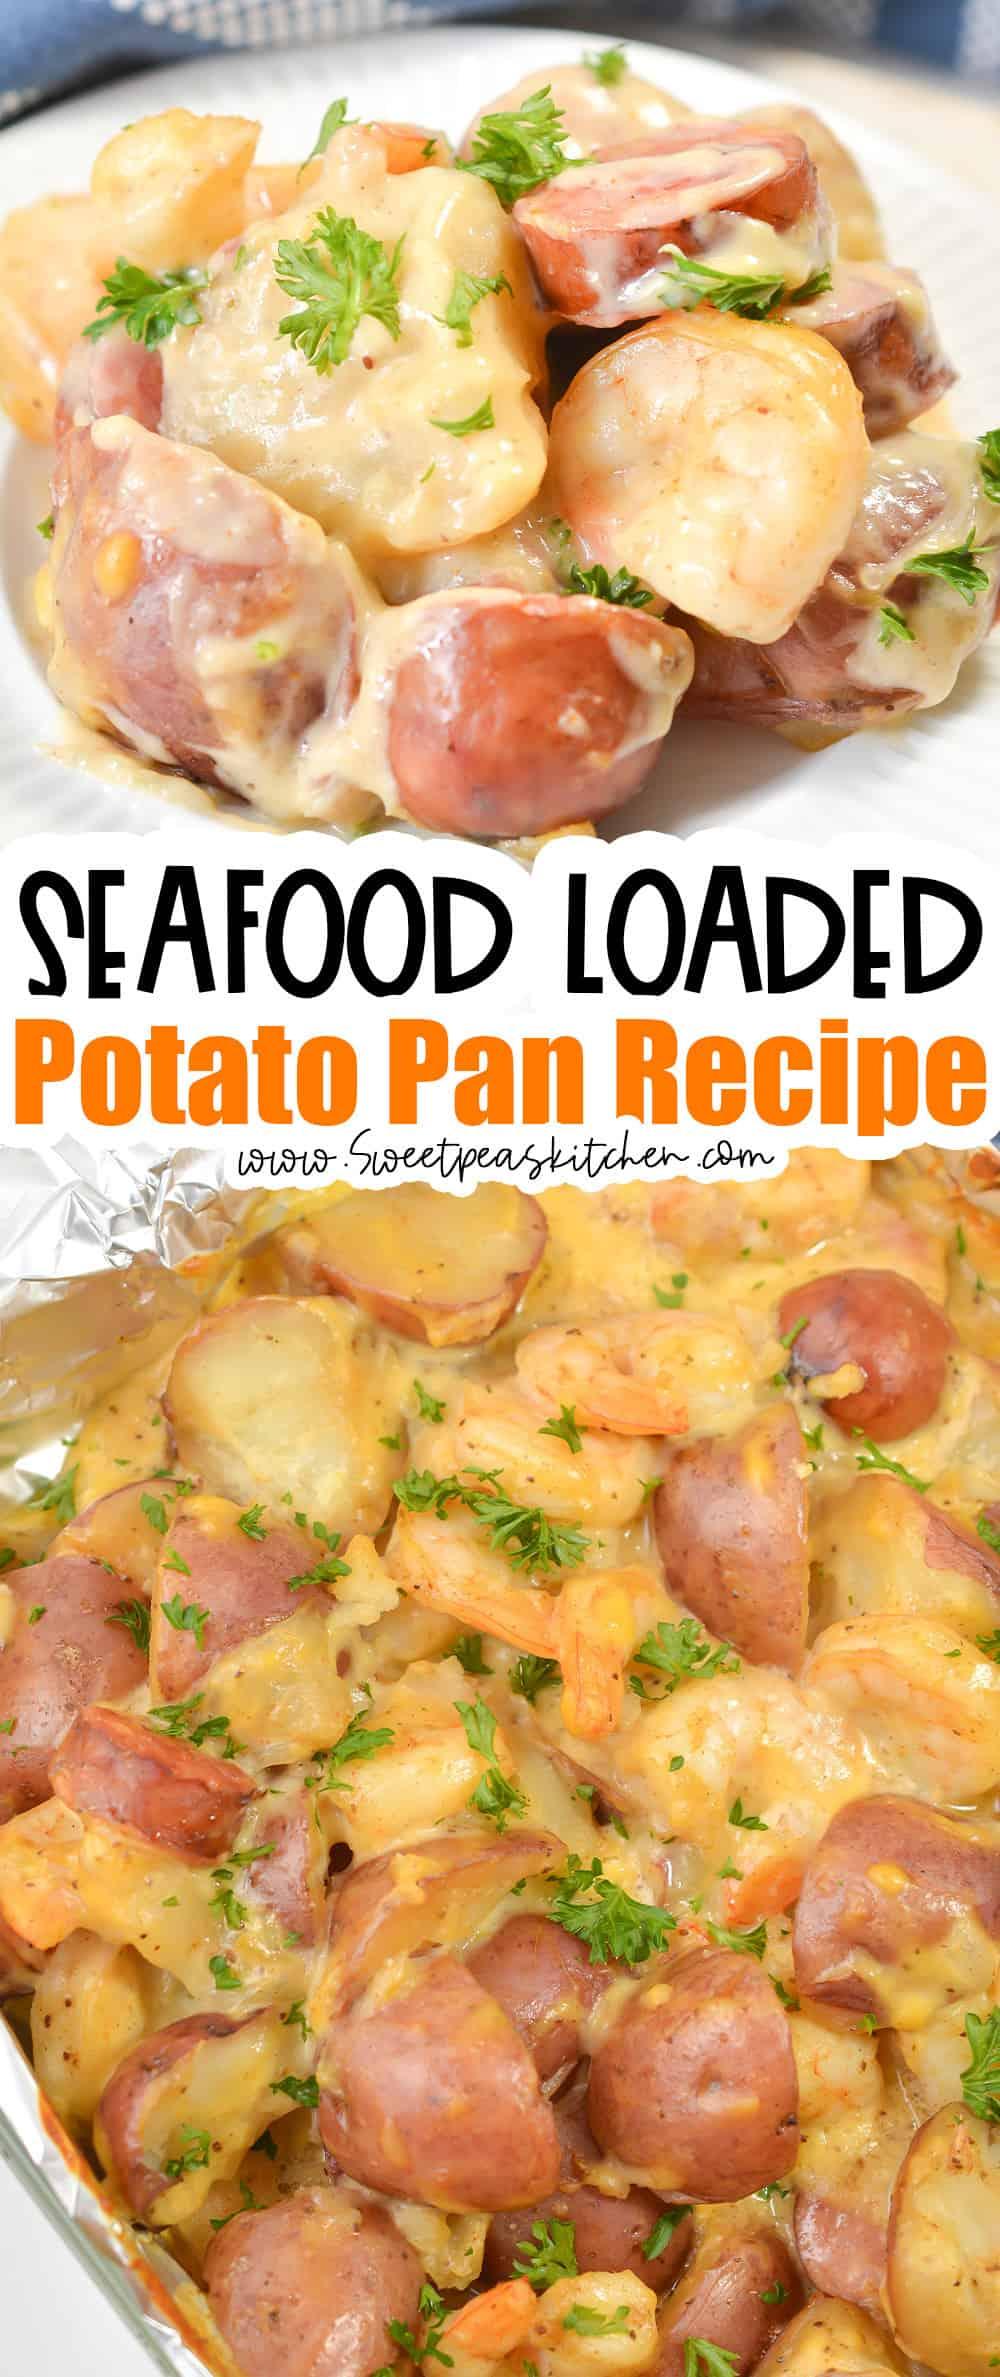 Seafood Loaded Potato Pan